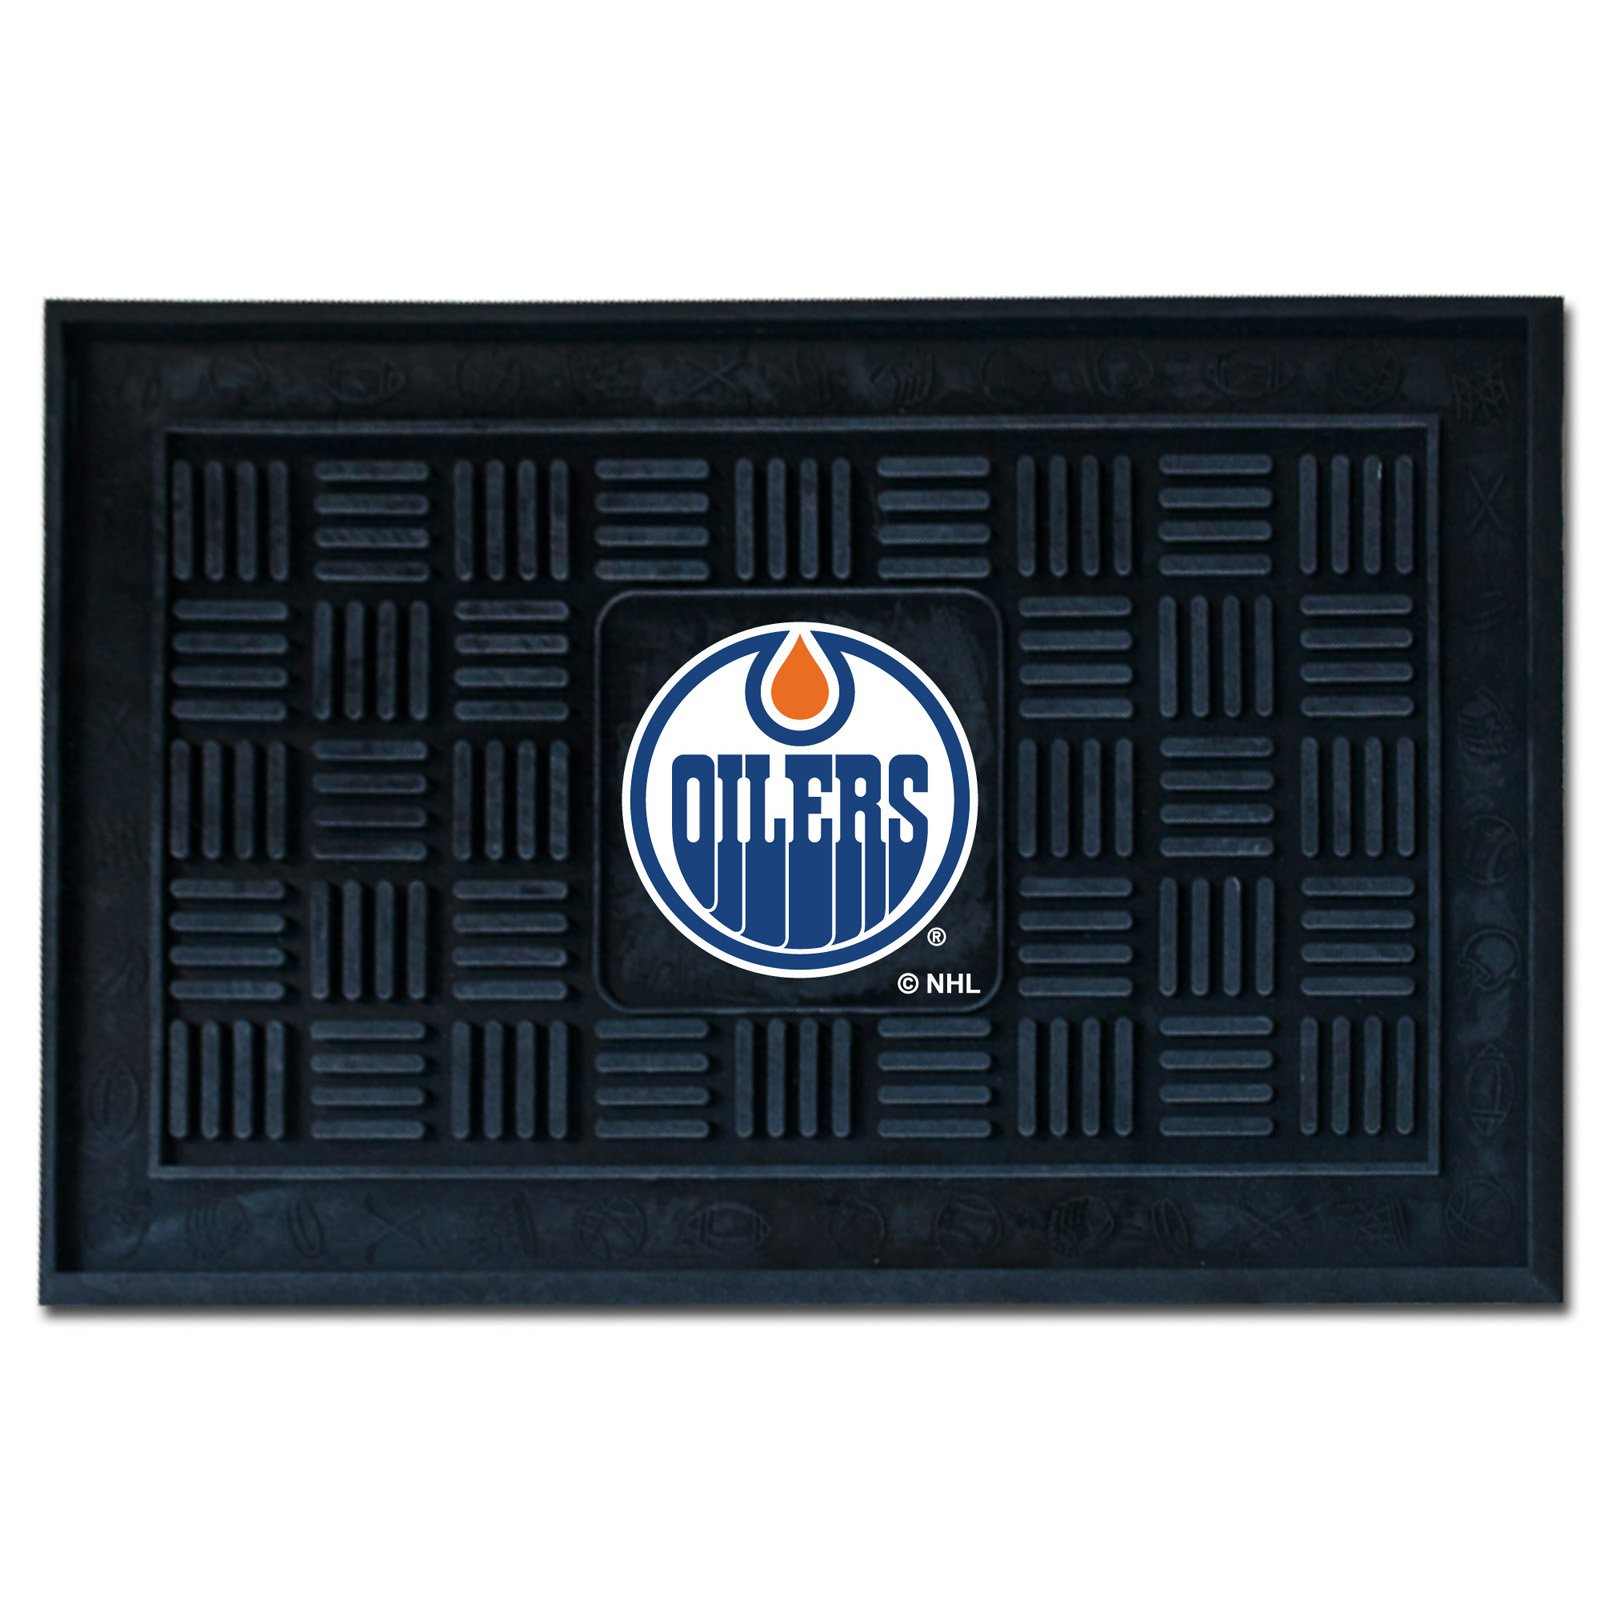 Fanmats NHL 18 x 30 in. Medallion Door Mat